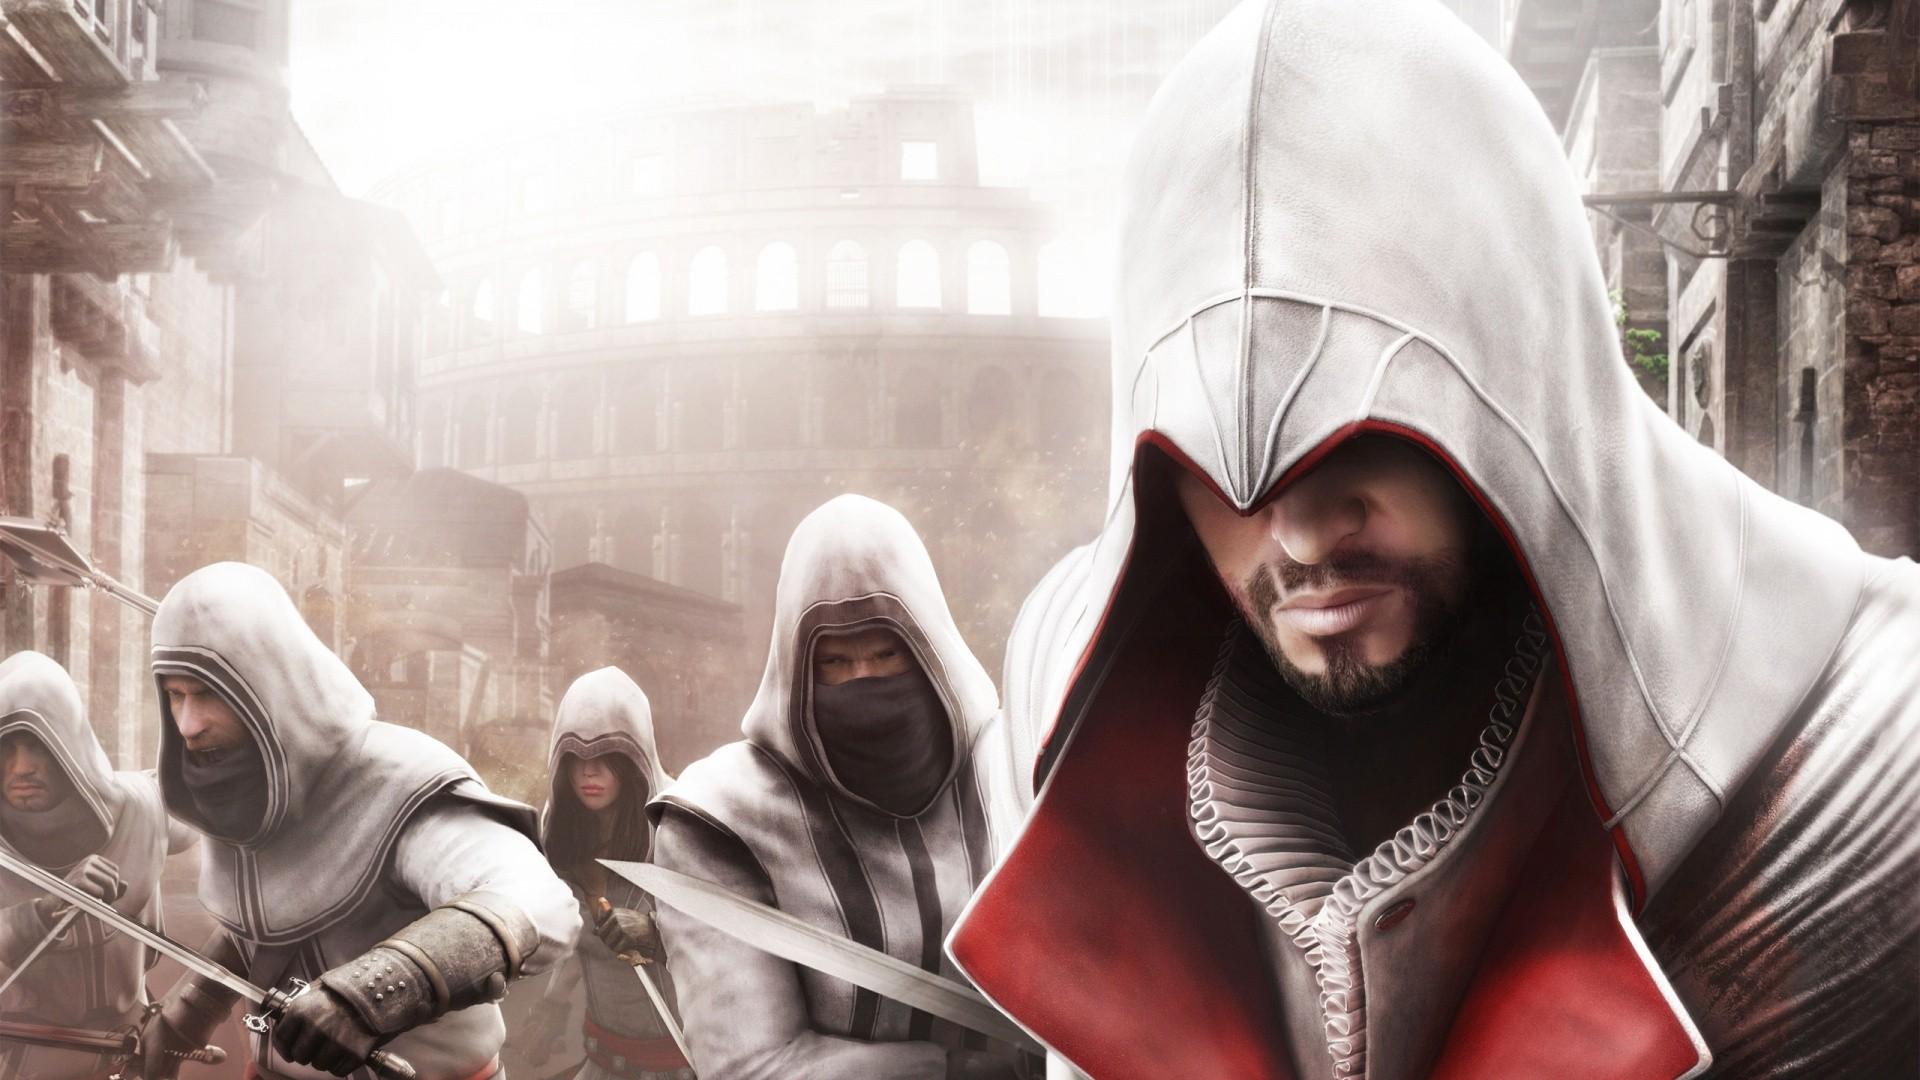 Assassin's Creed 2 Wallpaper Free